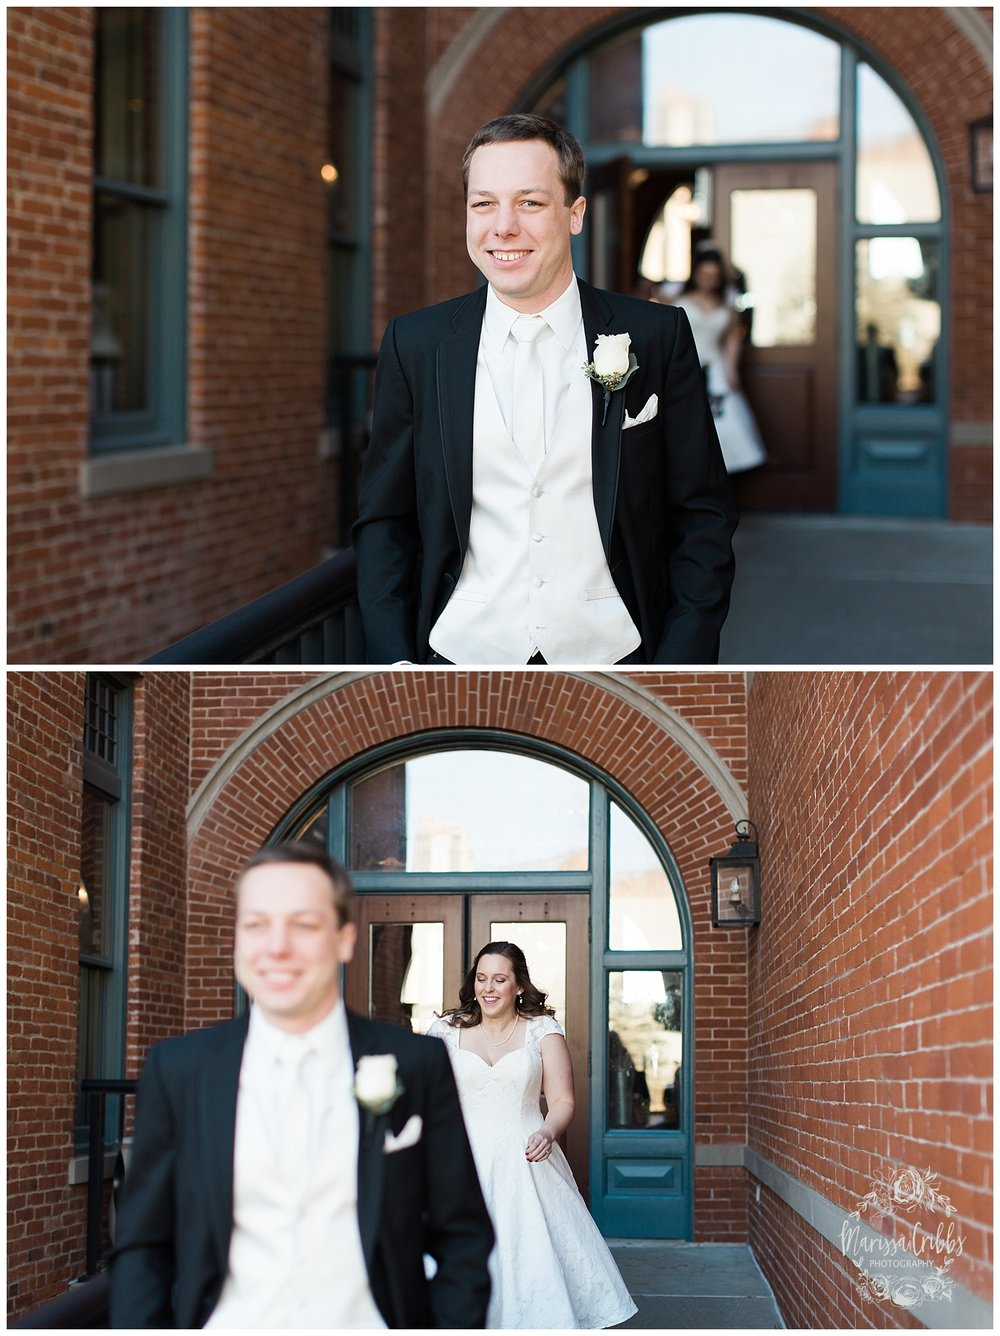 Webster House KC Wedding | KC Wedding Photographer | Marissa Cribbs Photography_0024.jpg